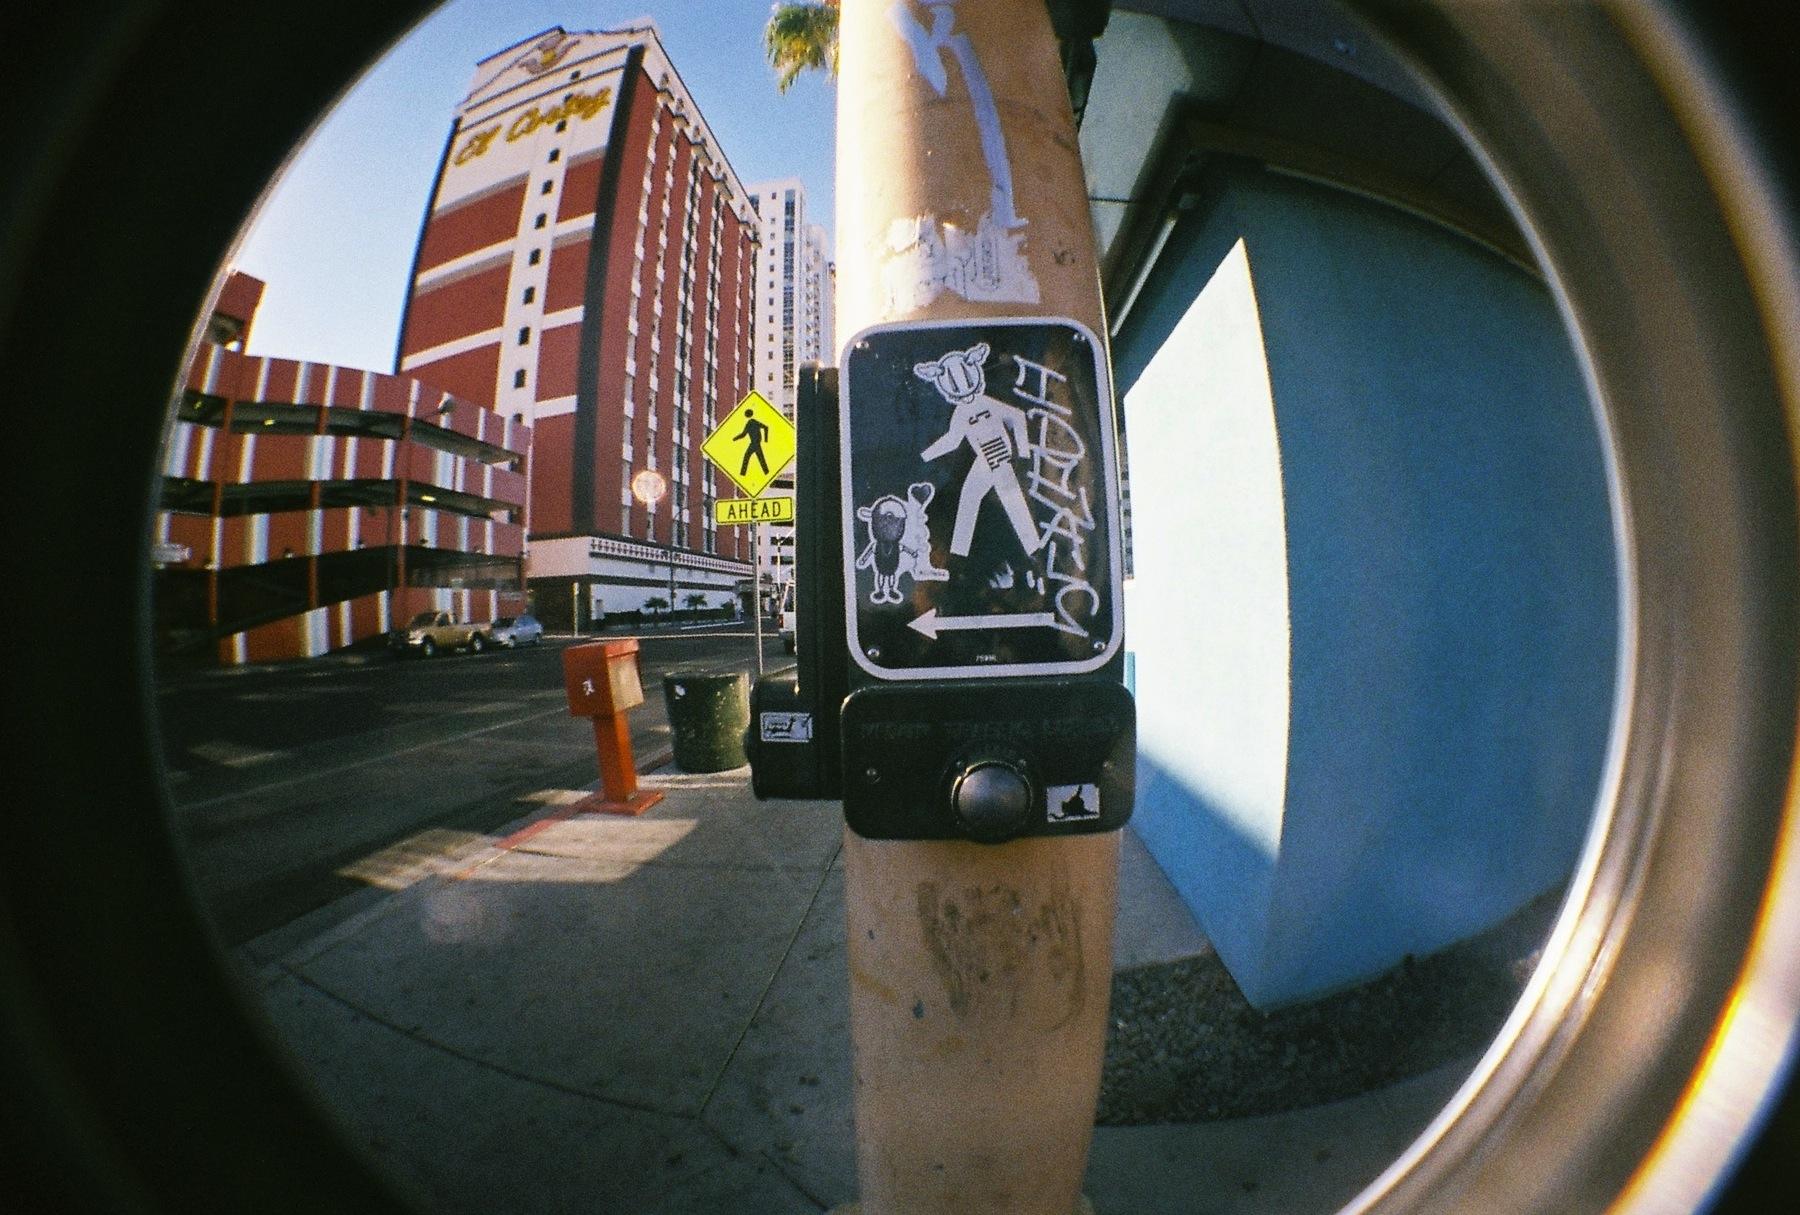 d*face strikes downtown 2013